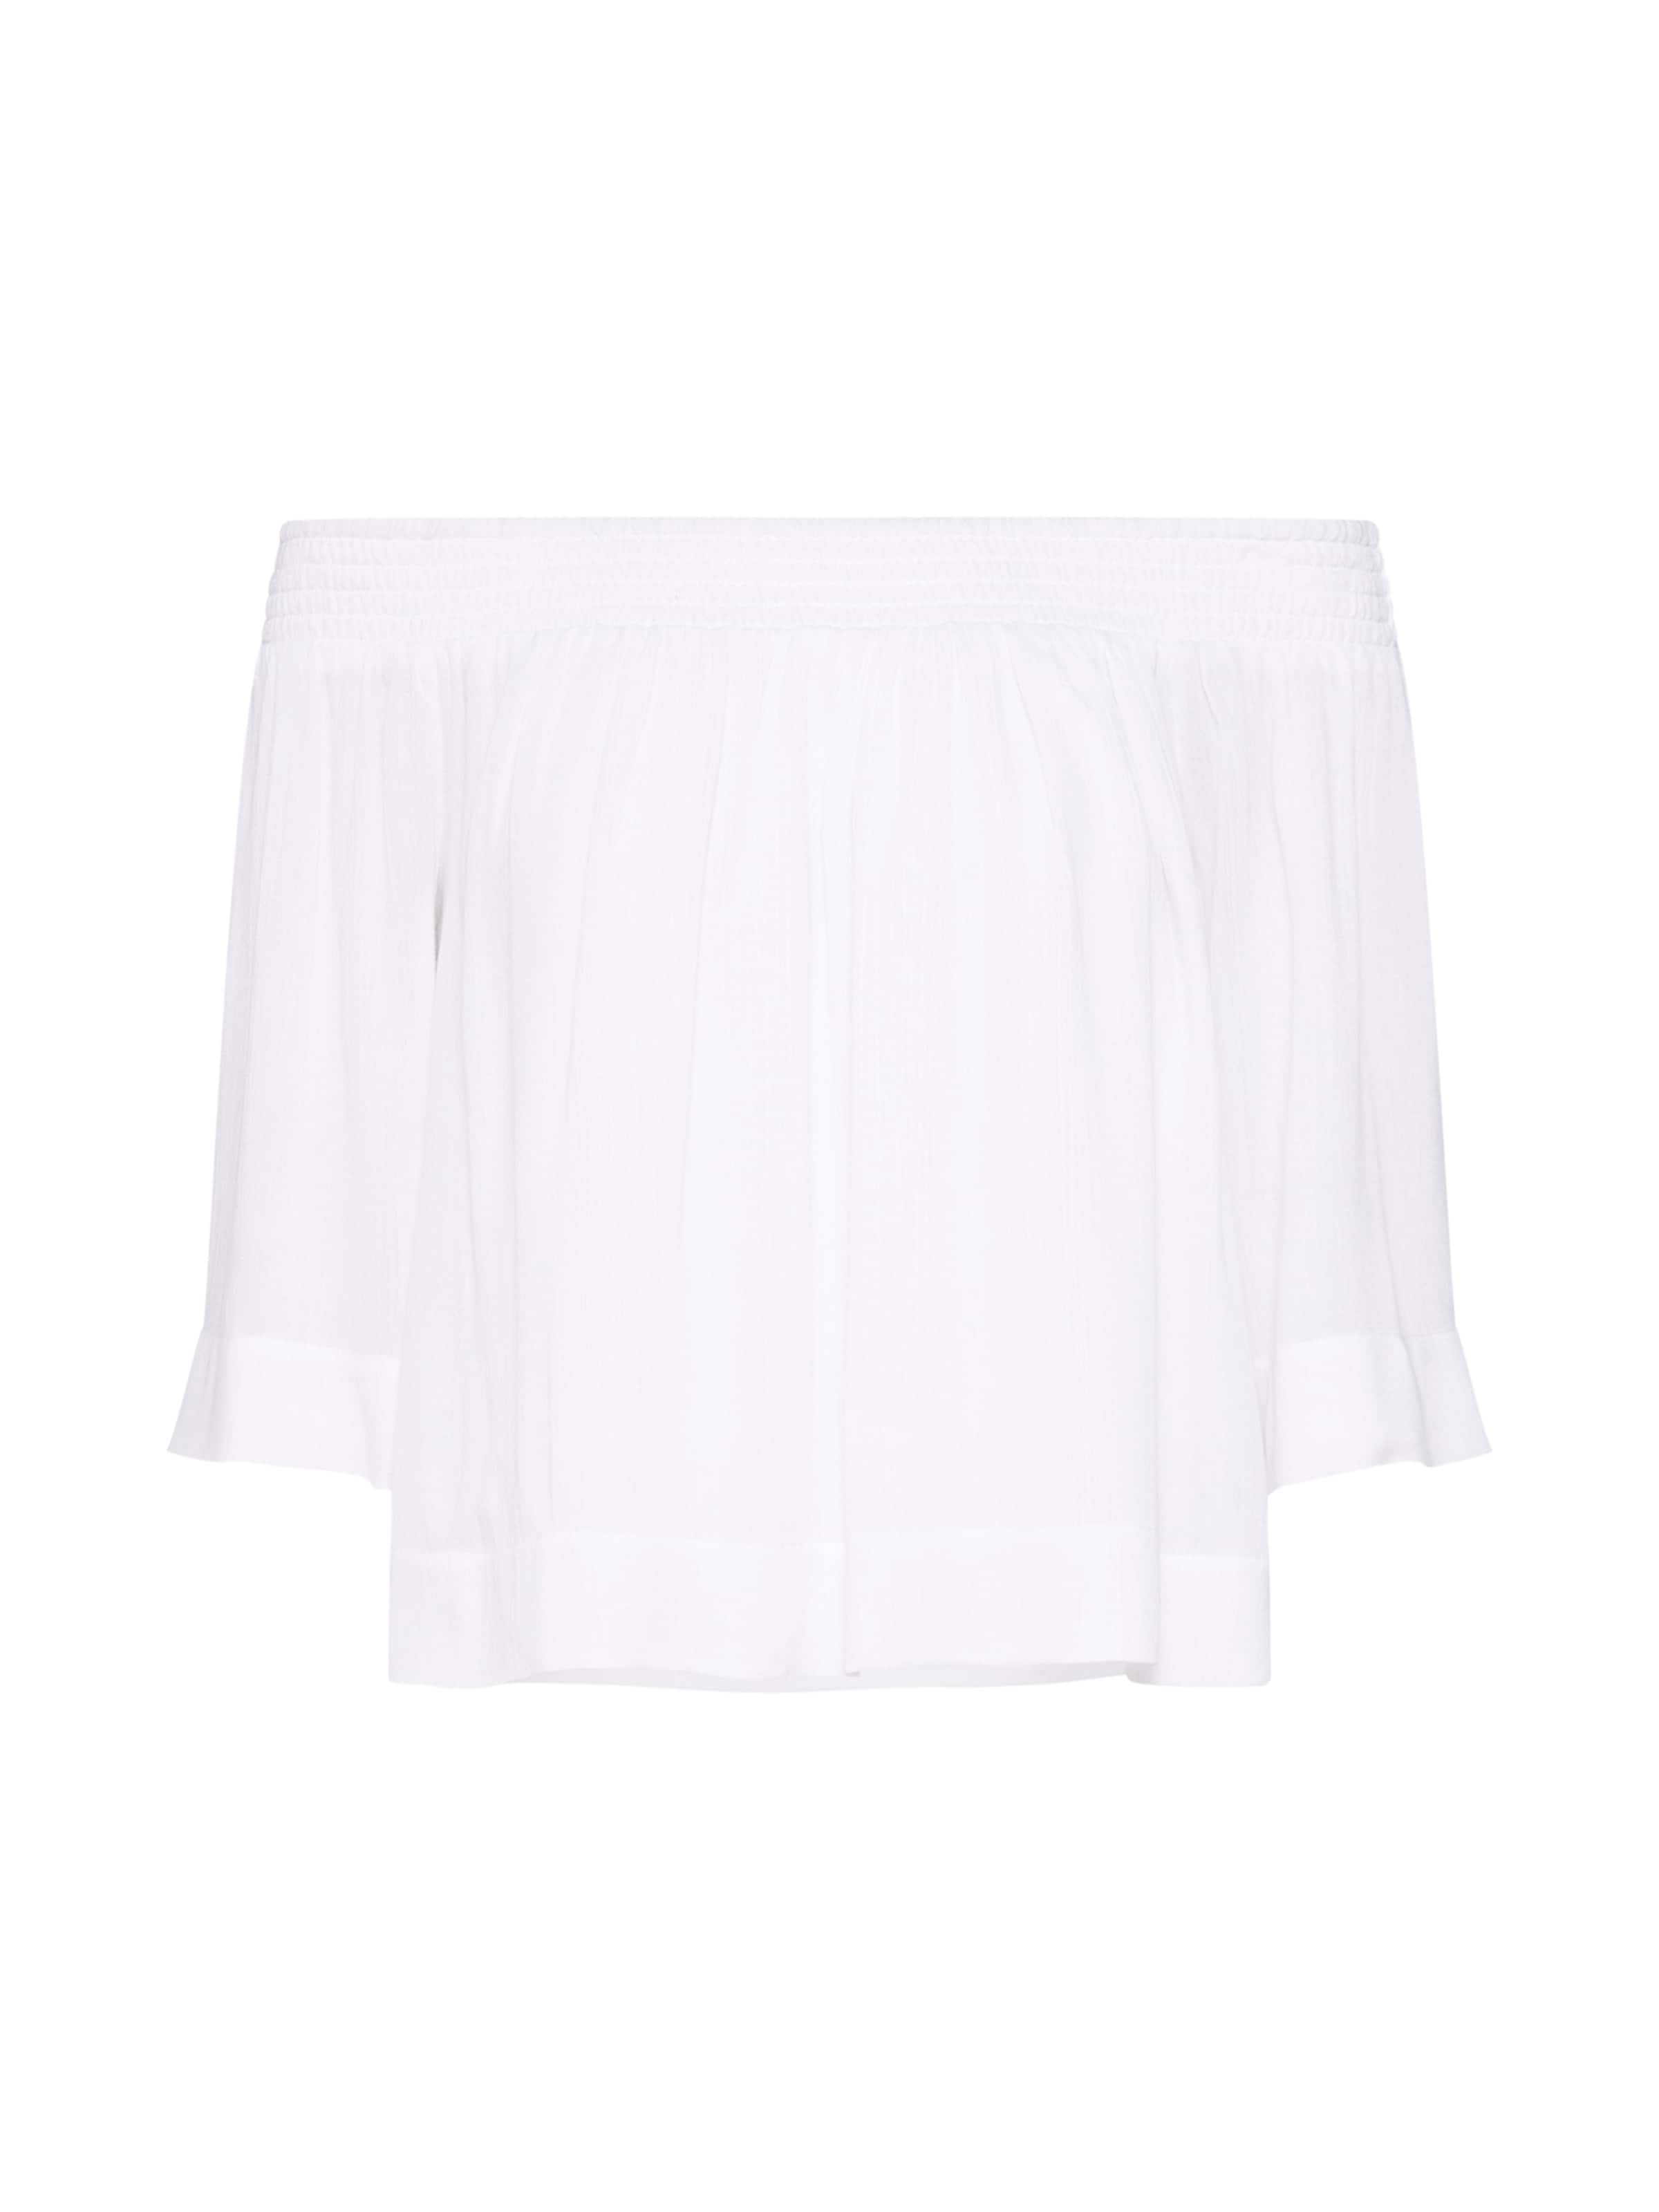 You Blanc 'camille' shirt En T About uc3KJ1TlF